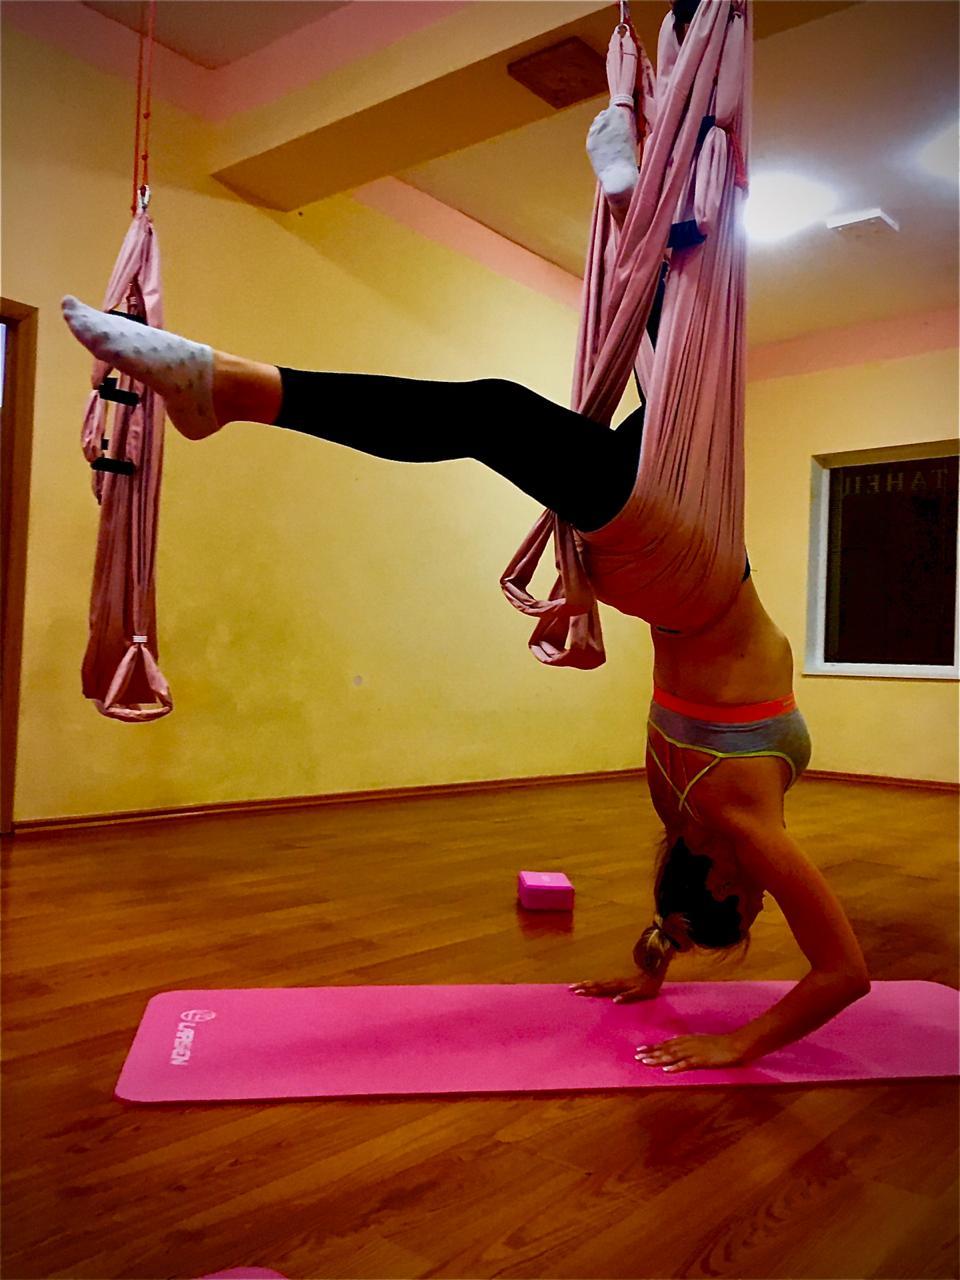 Лексика стиля йоги: все о хатха-йоге .